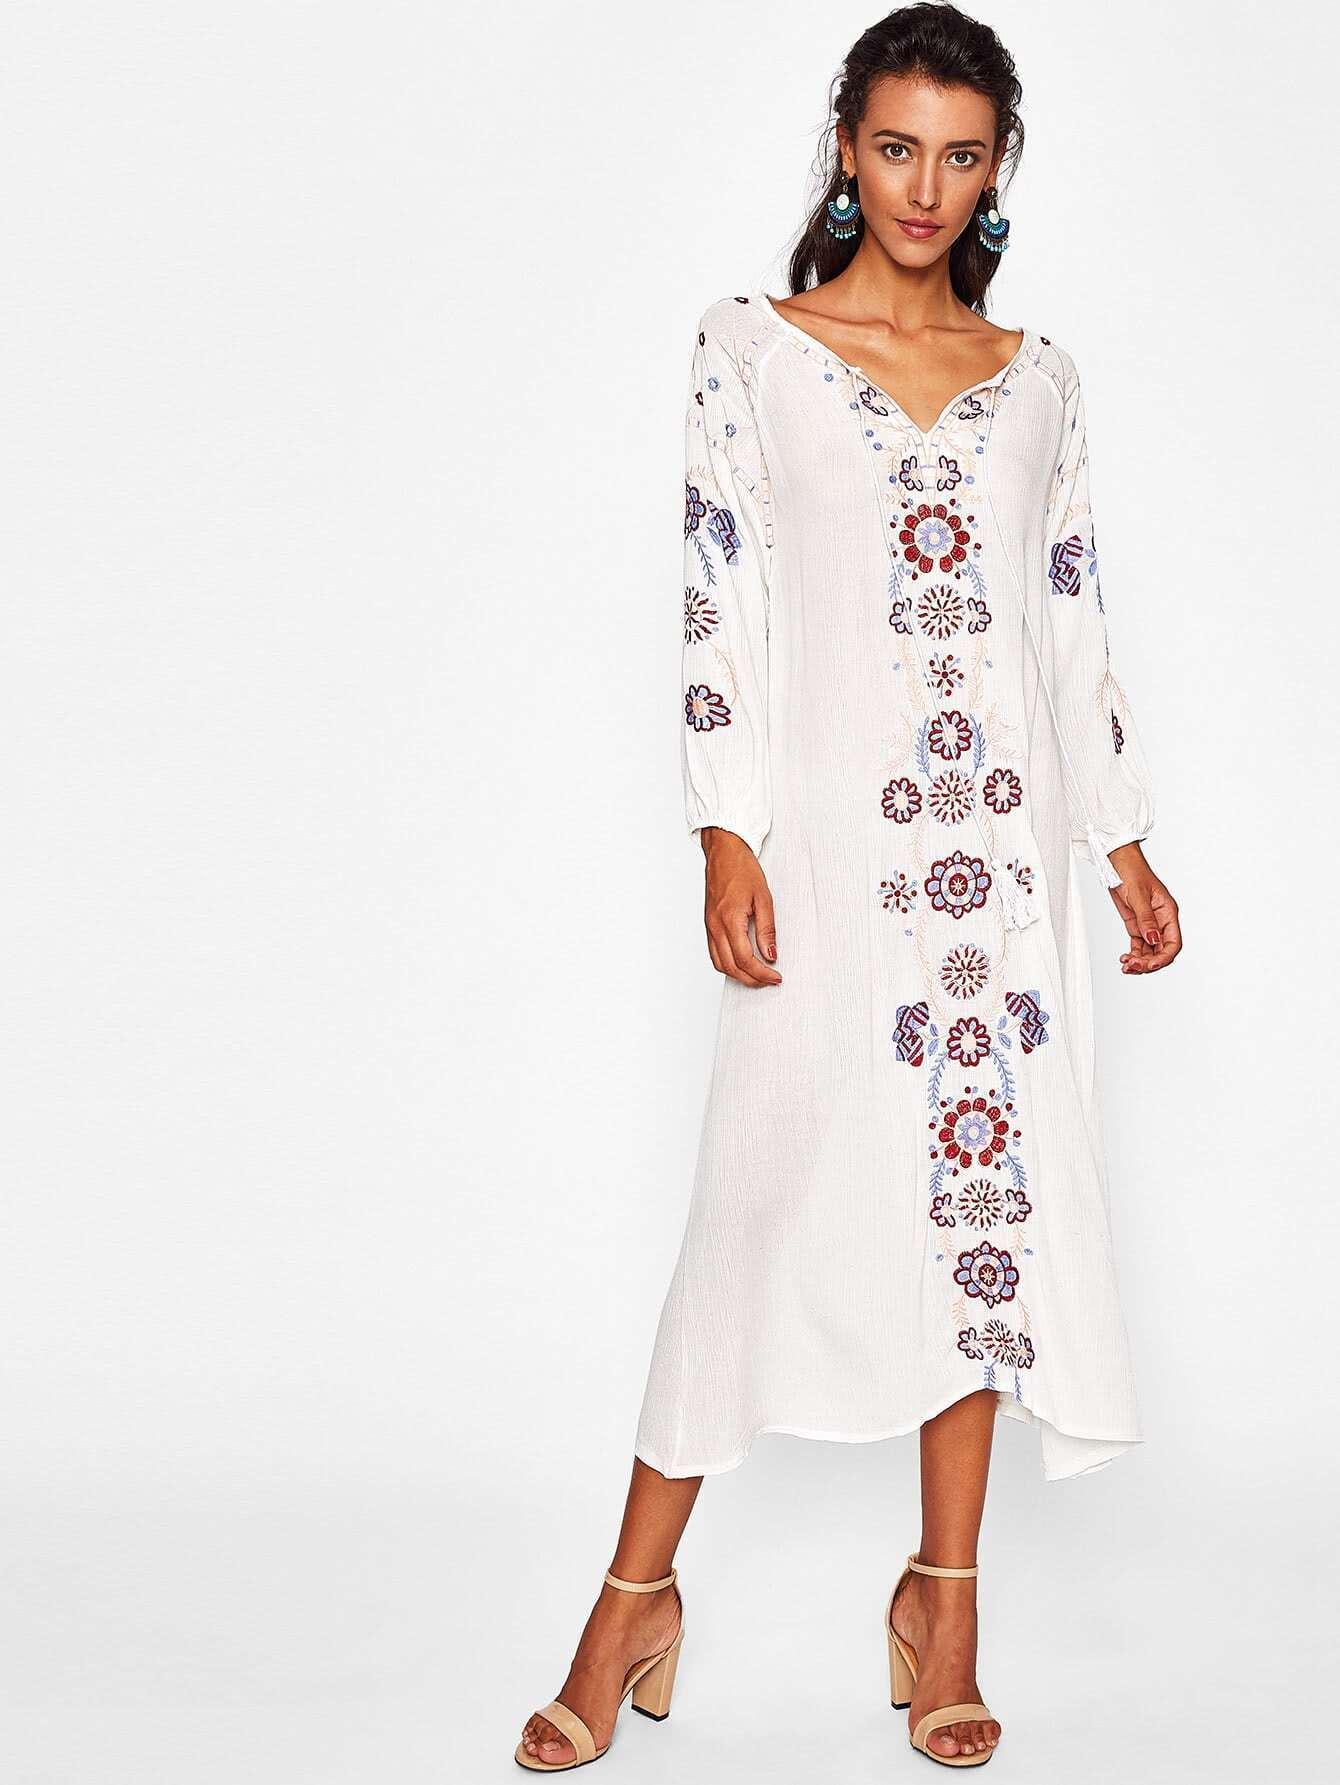 Botanical Embroidered Self Tie Neckline Dress